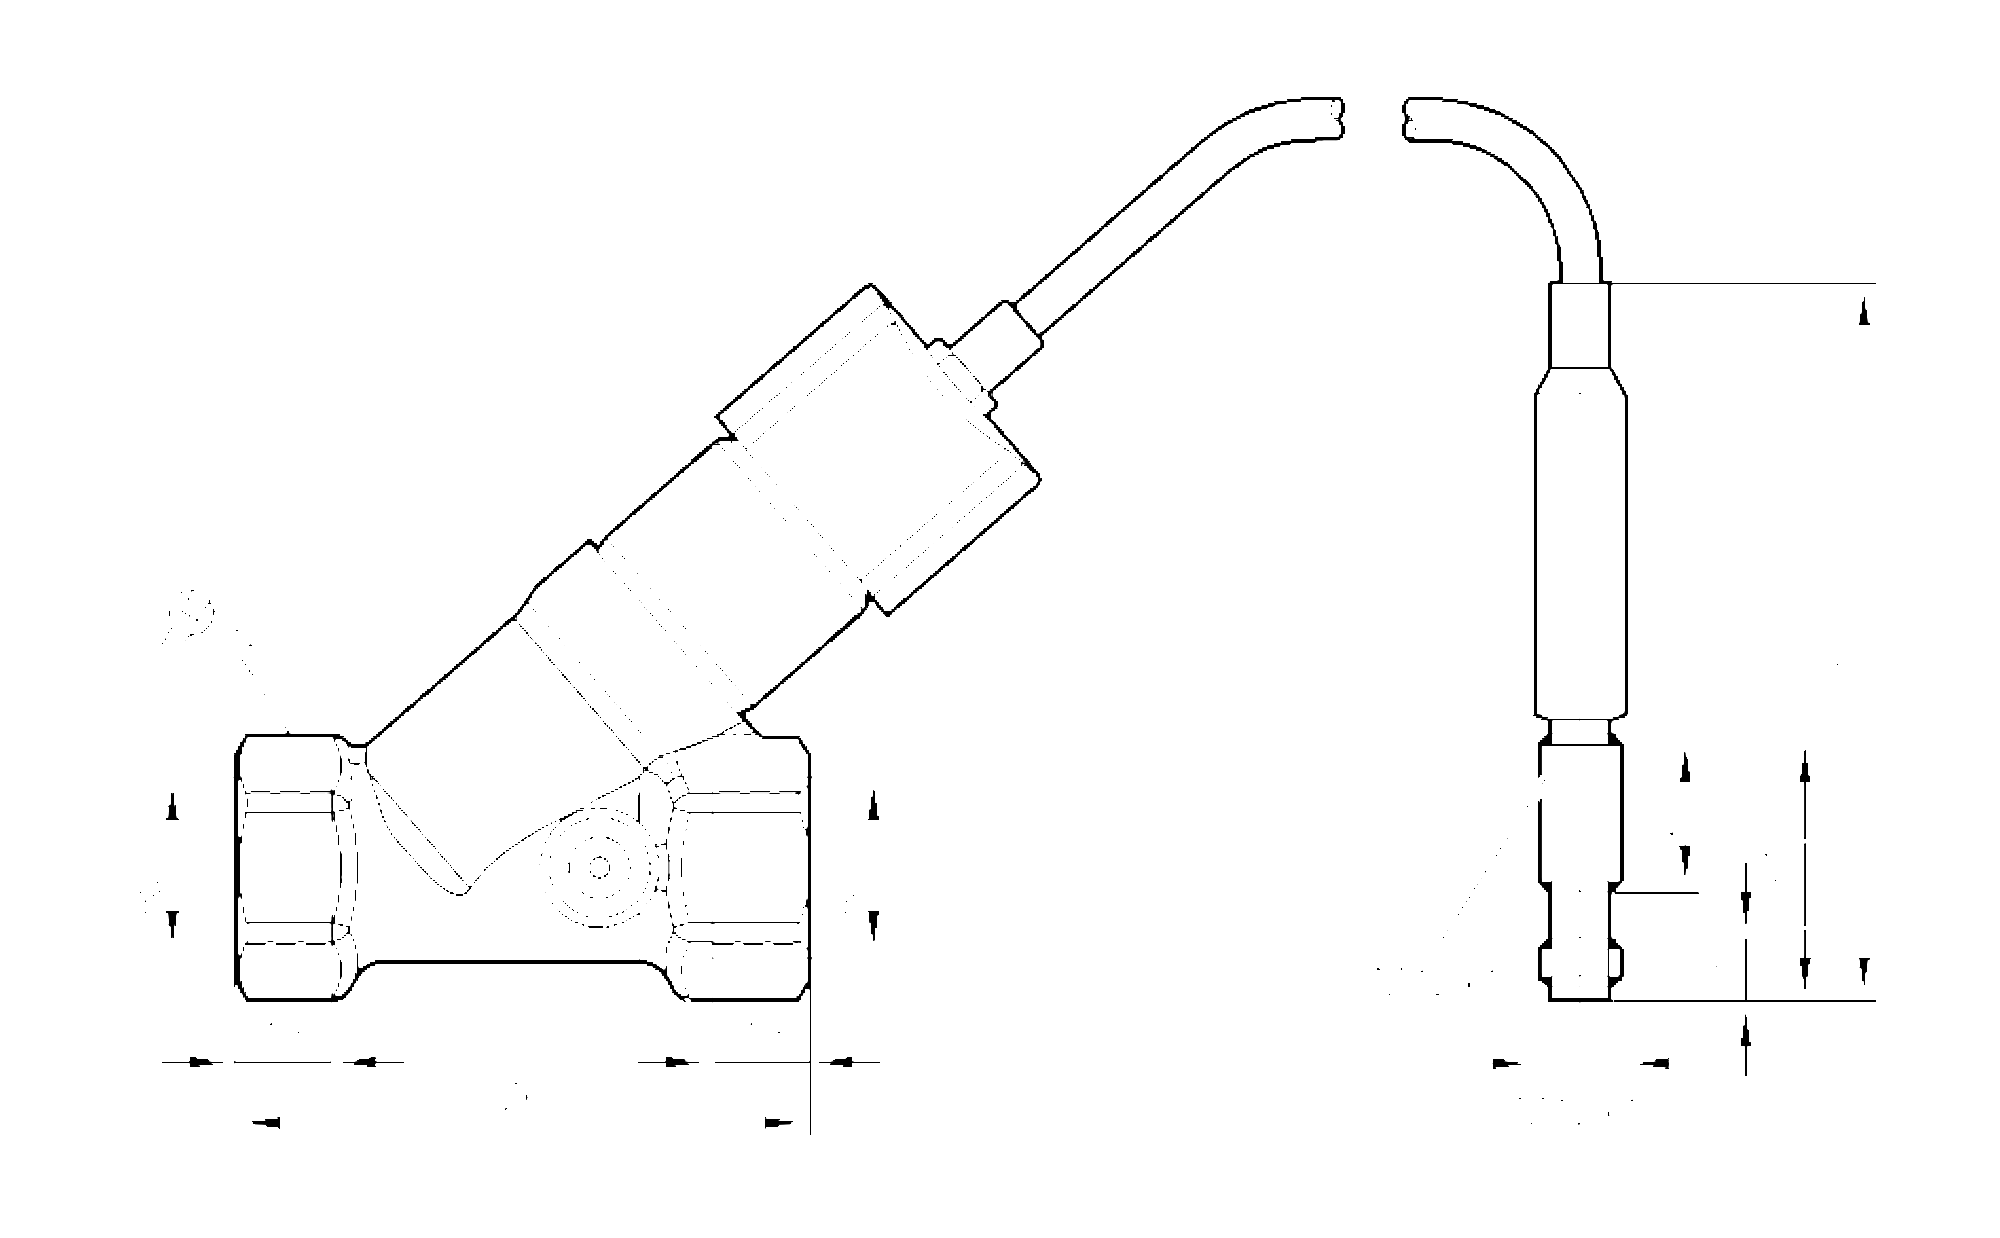 sbt634